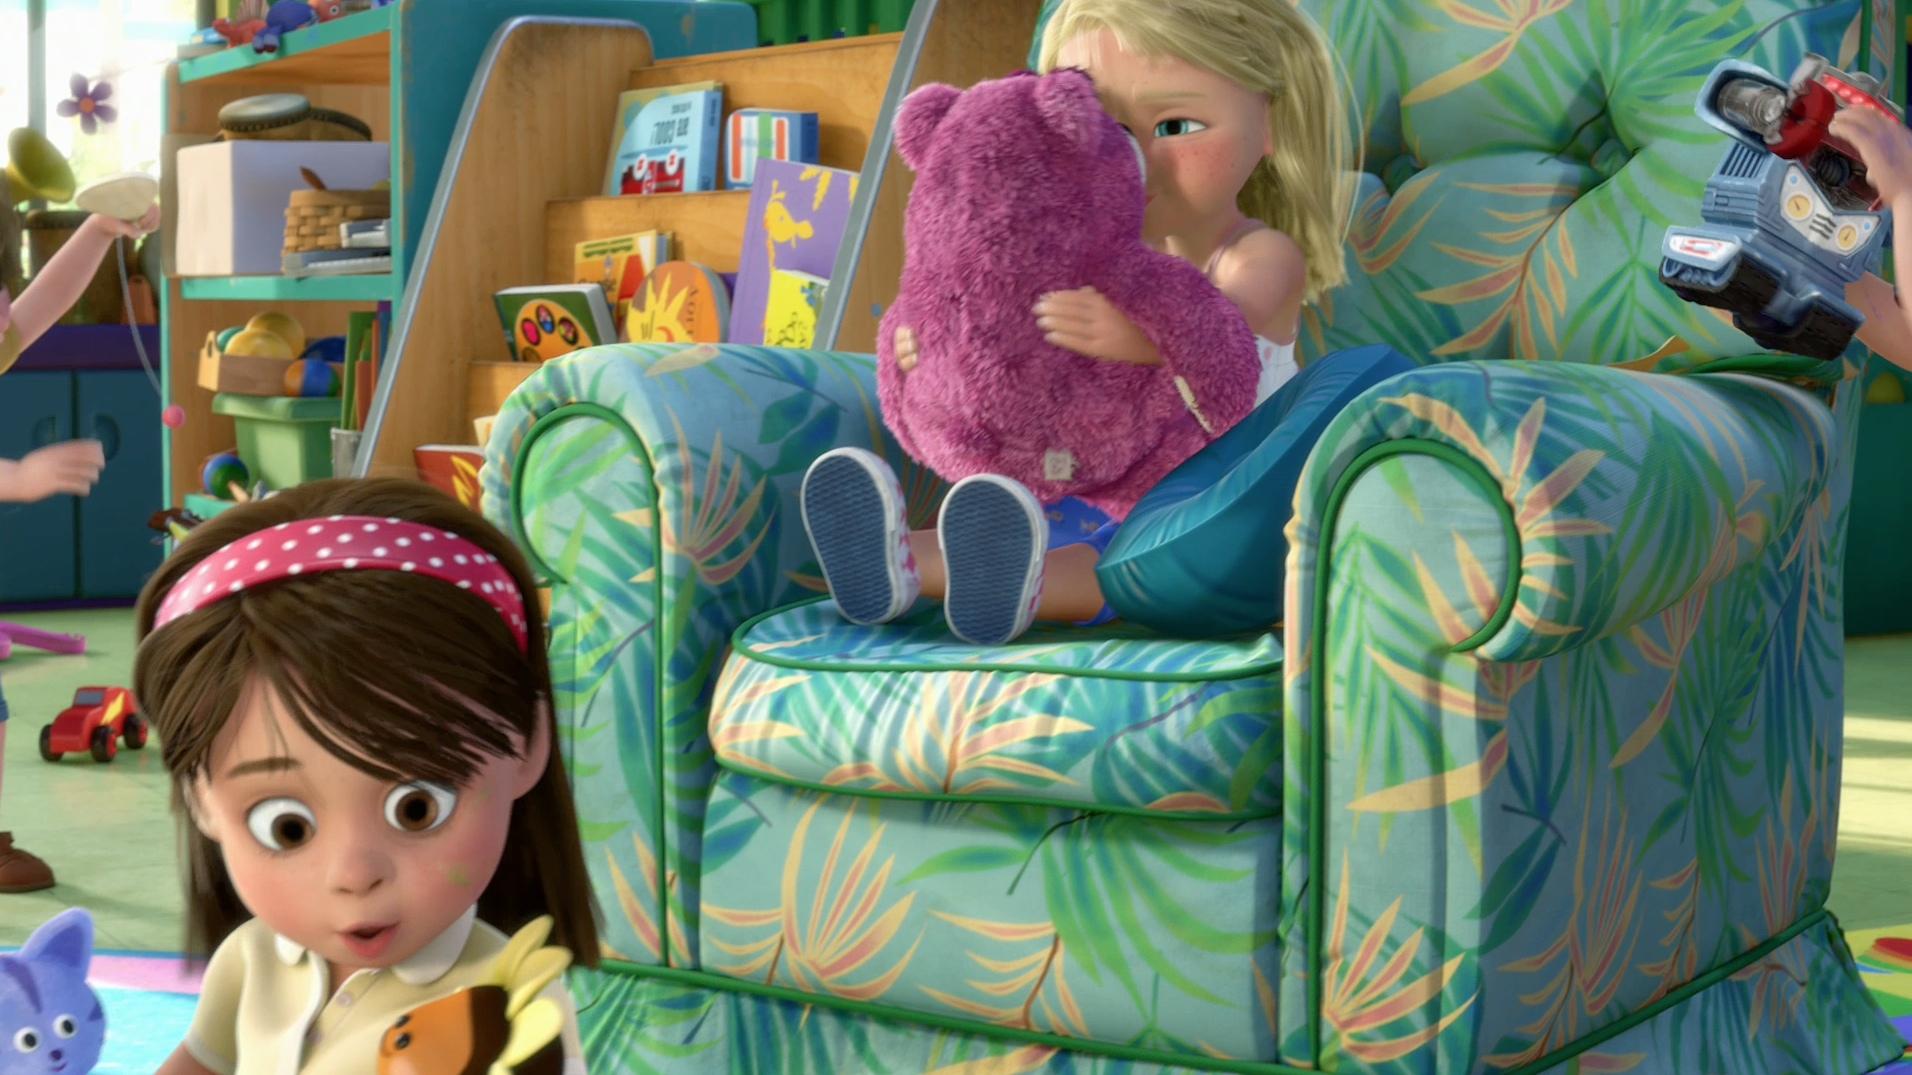 Disney Toy Story 3 Day Care Dash : 【pixar ピクサー】トイ・ストーリー【 興行no スタート!】